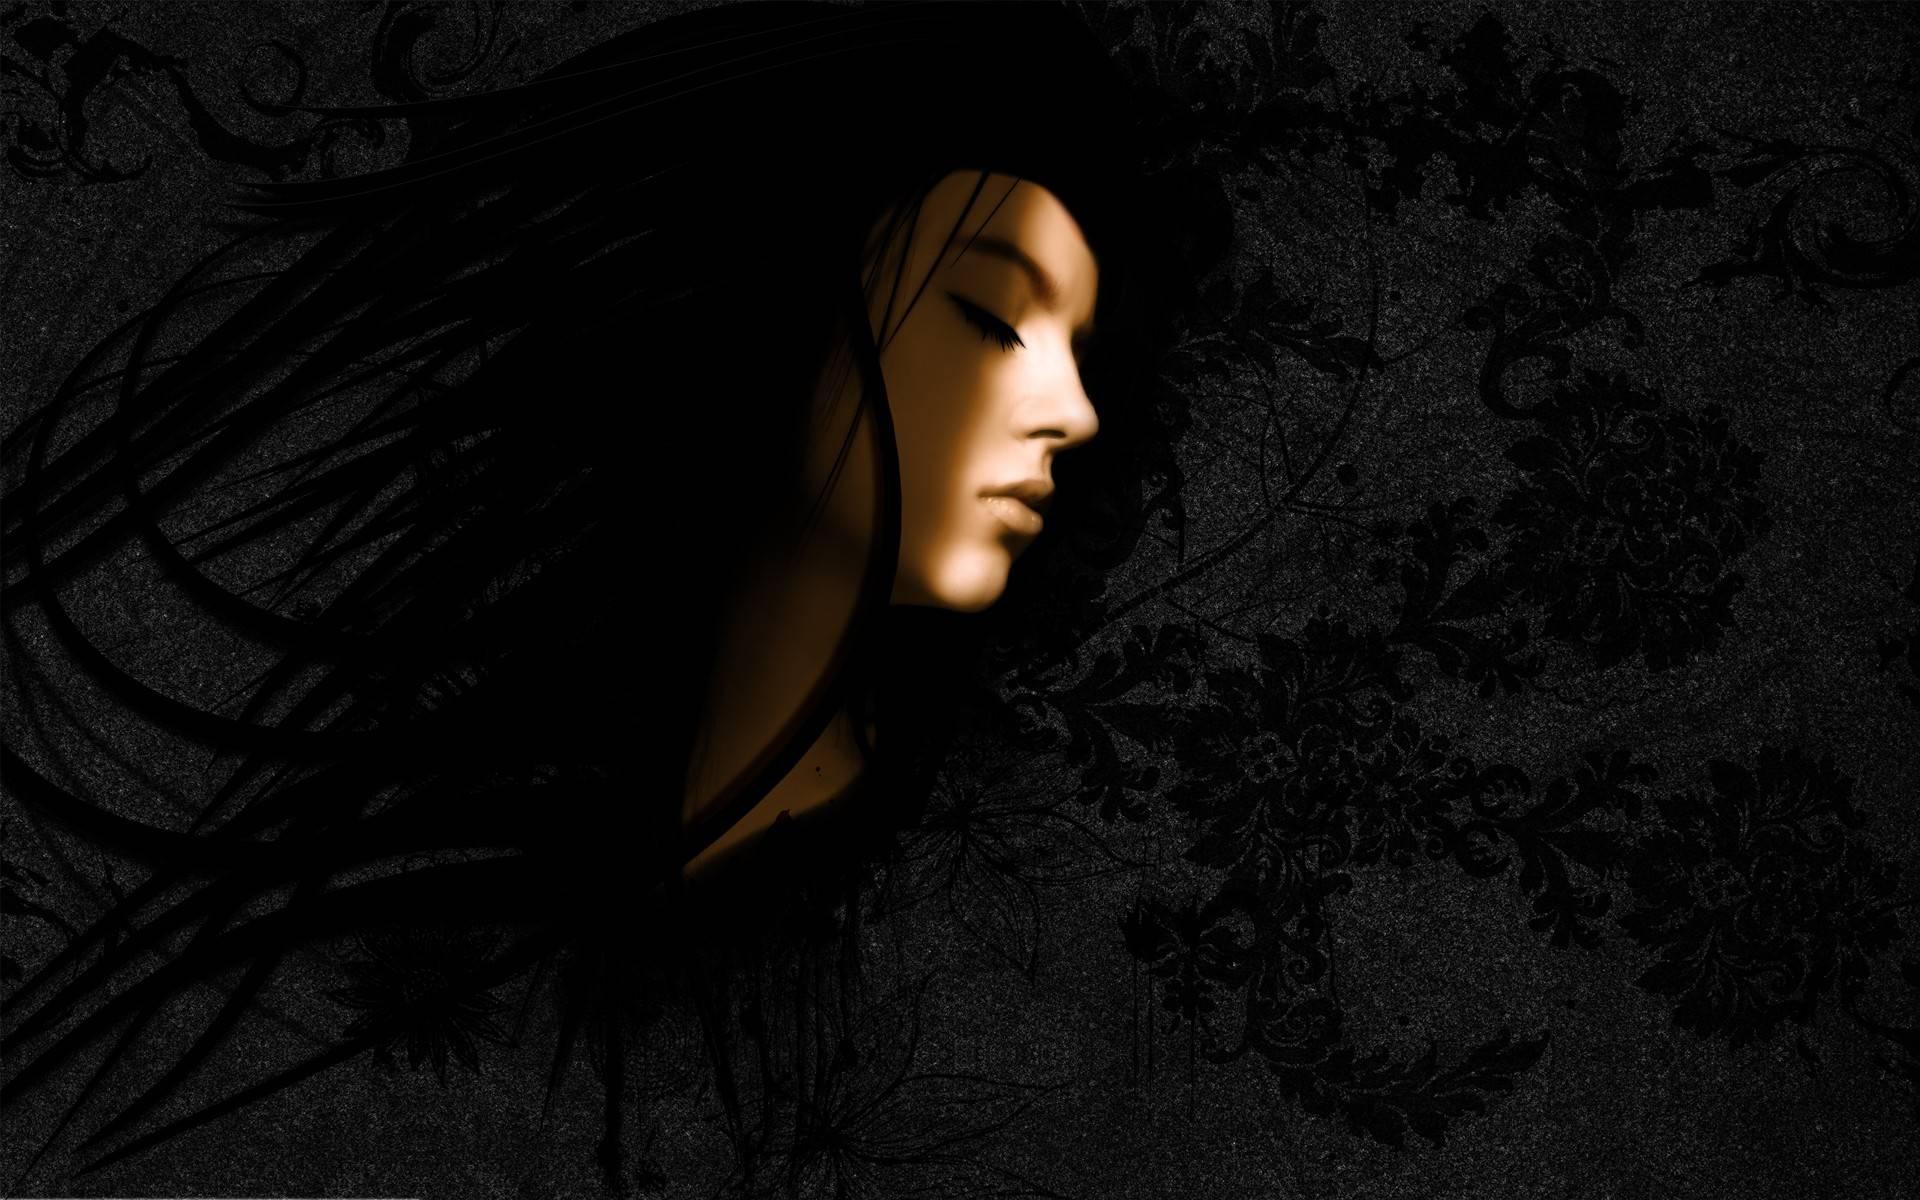 Girl Face Black White Makeup Themes